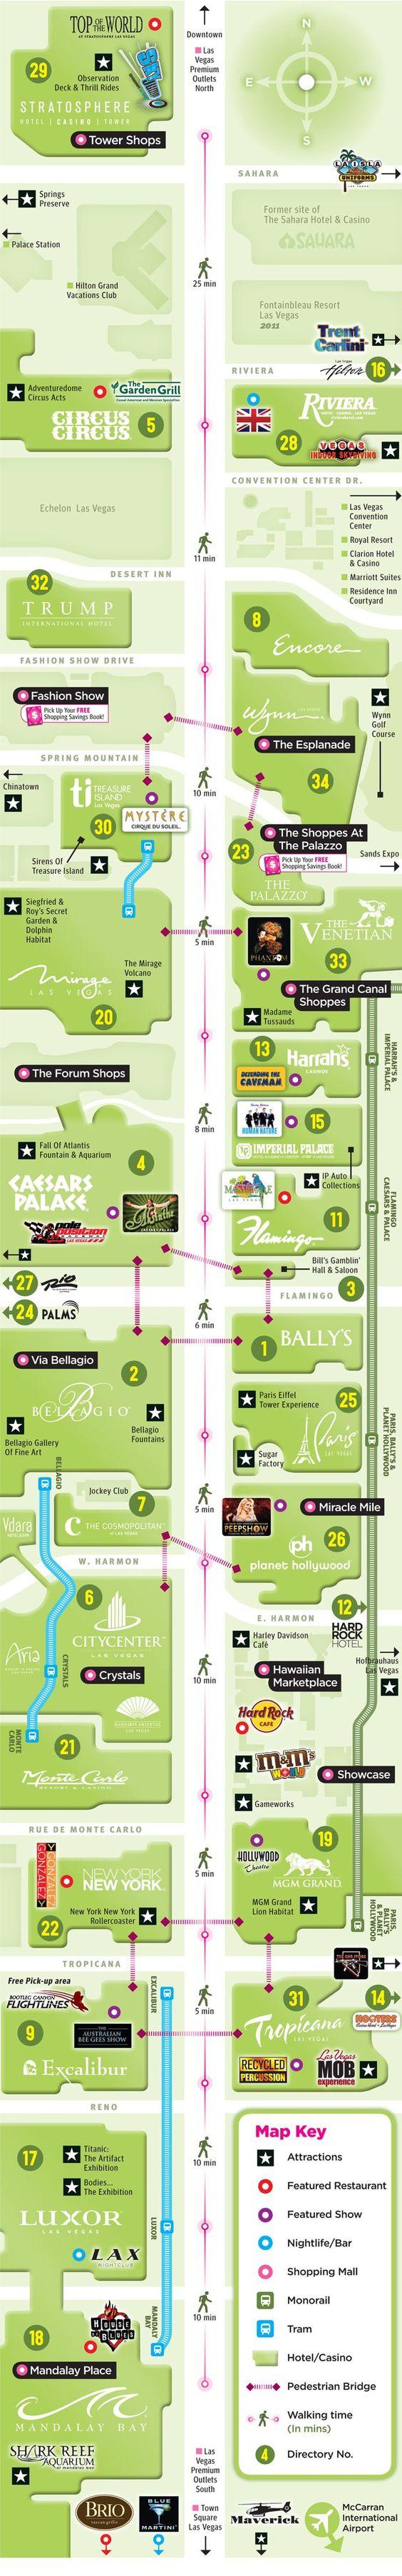 Mapa-infografía para guiarse en el recorrido por las vegas Boulevard. Pocket Vegas | Interactive Map